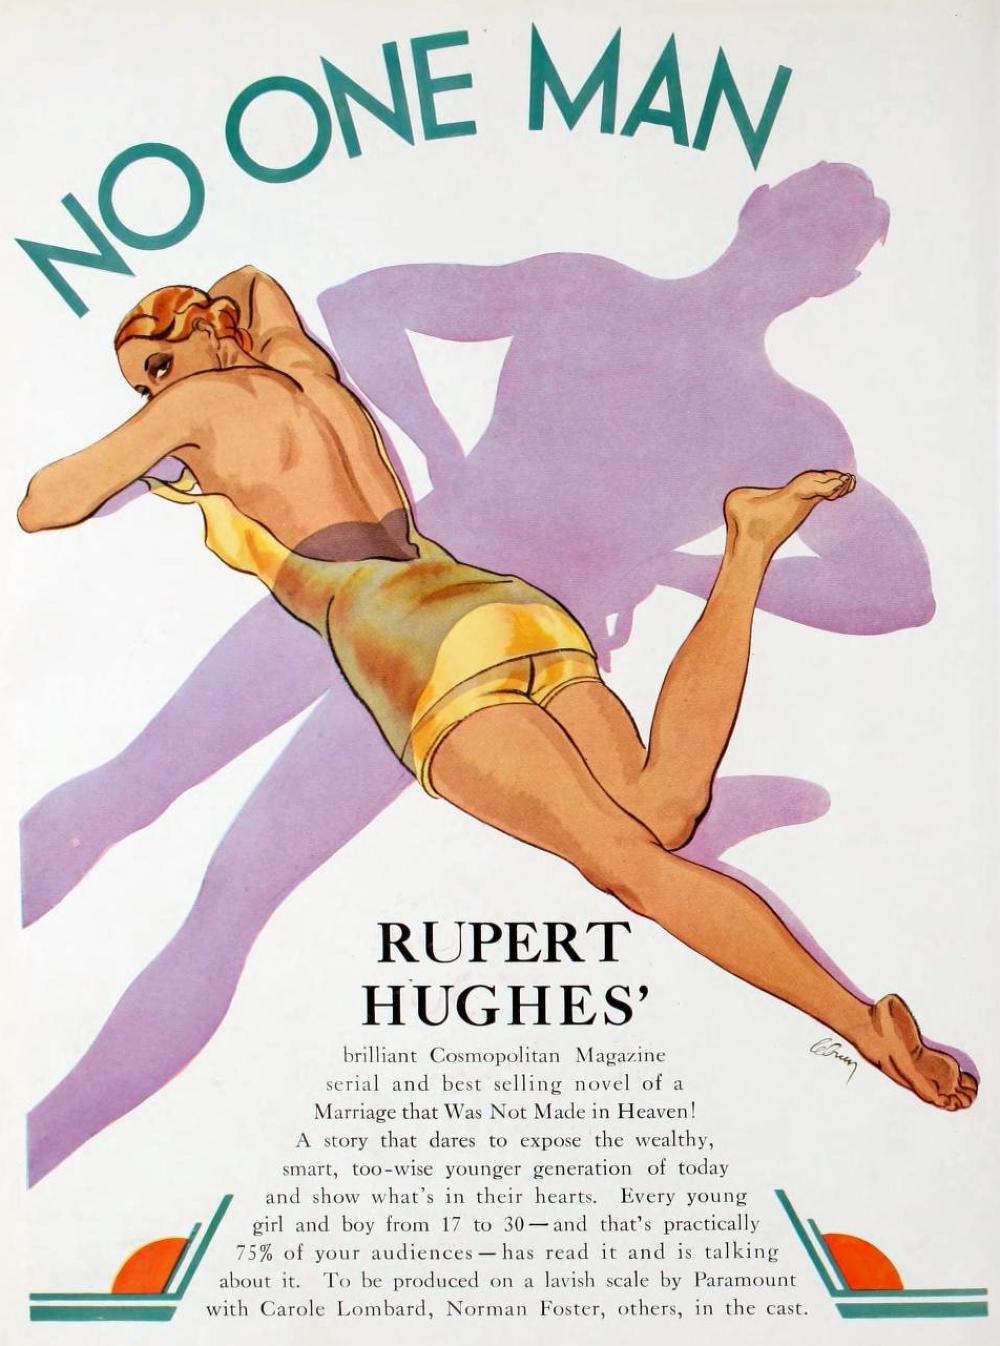 carole lombard no one man 1931-32 paramount pressbook 00a